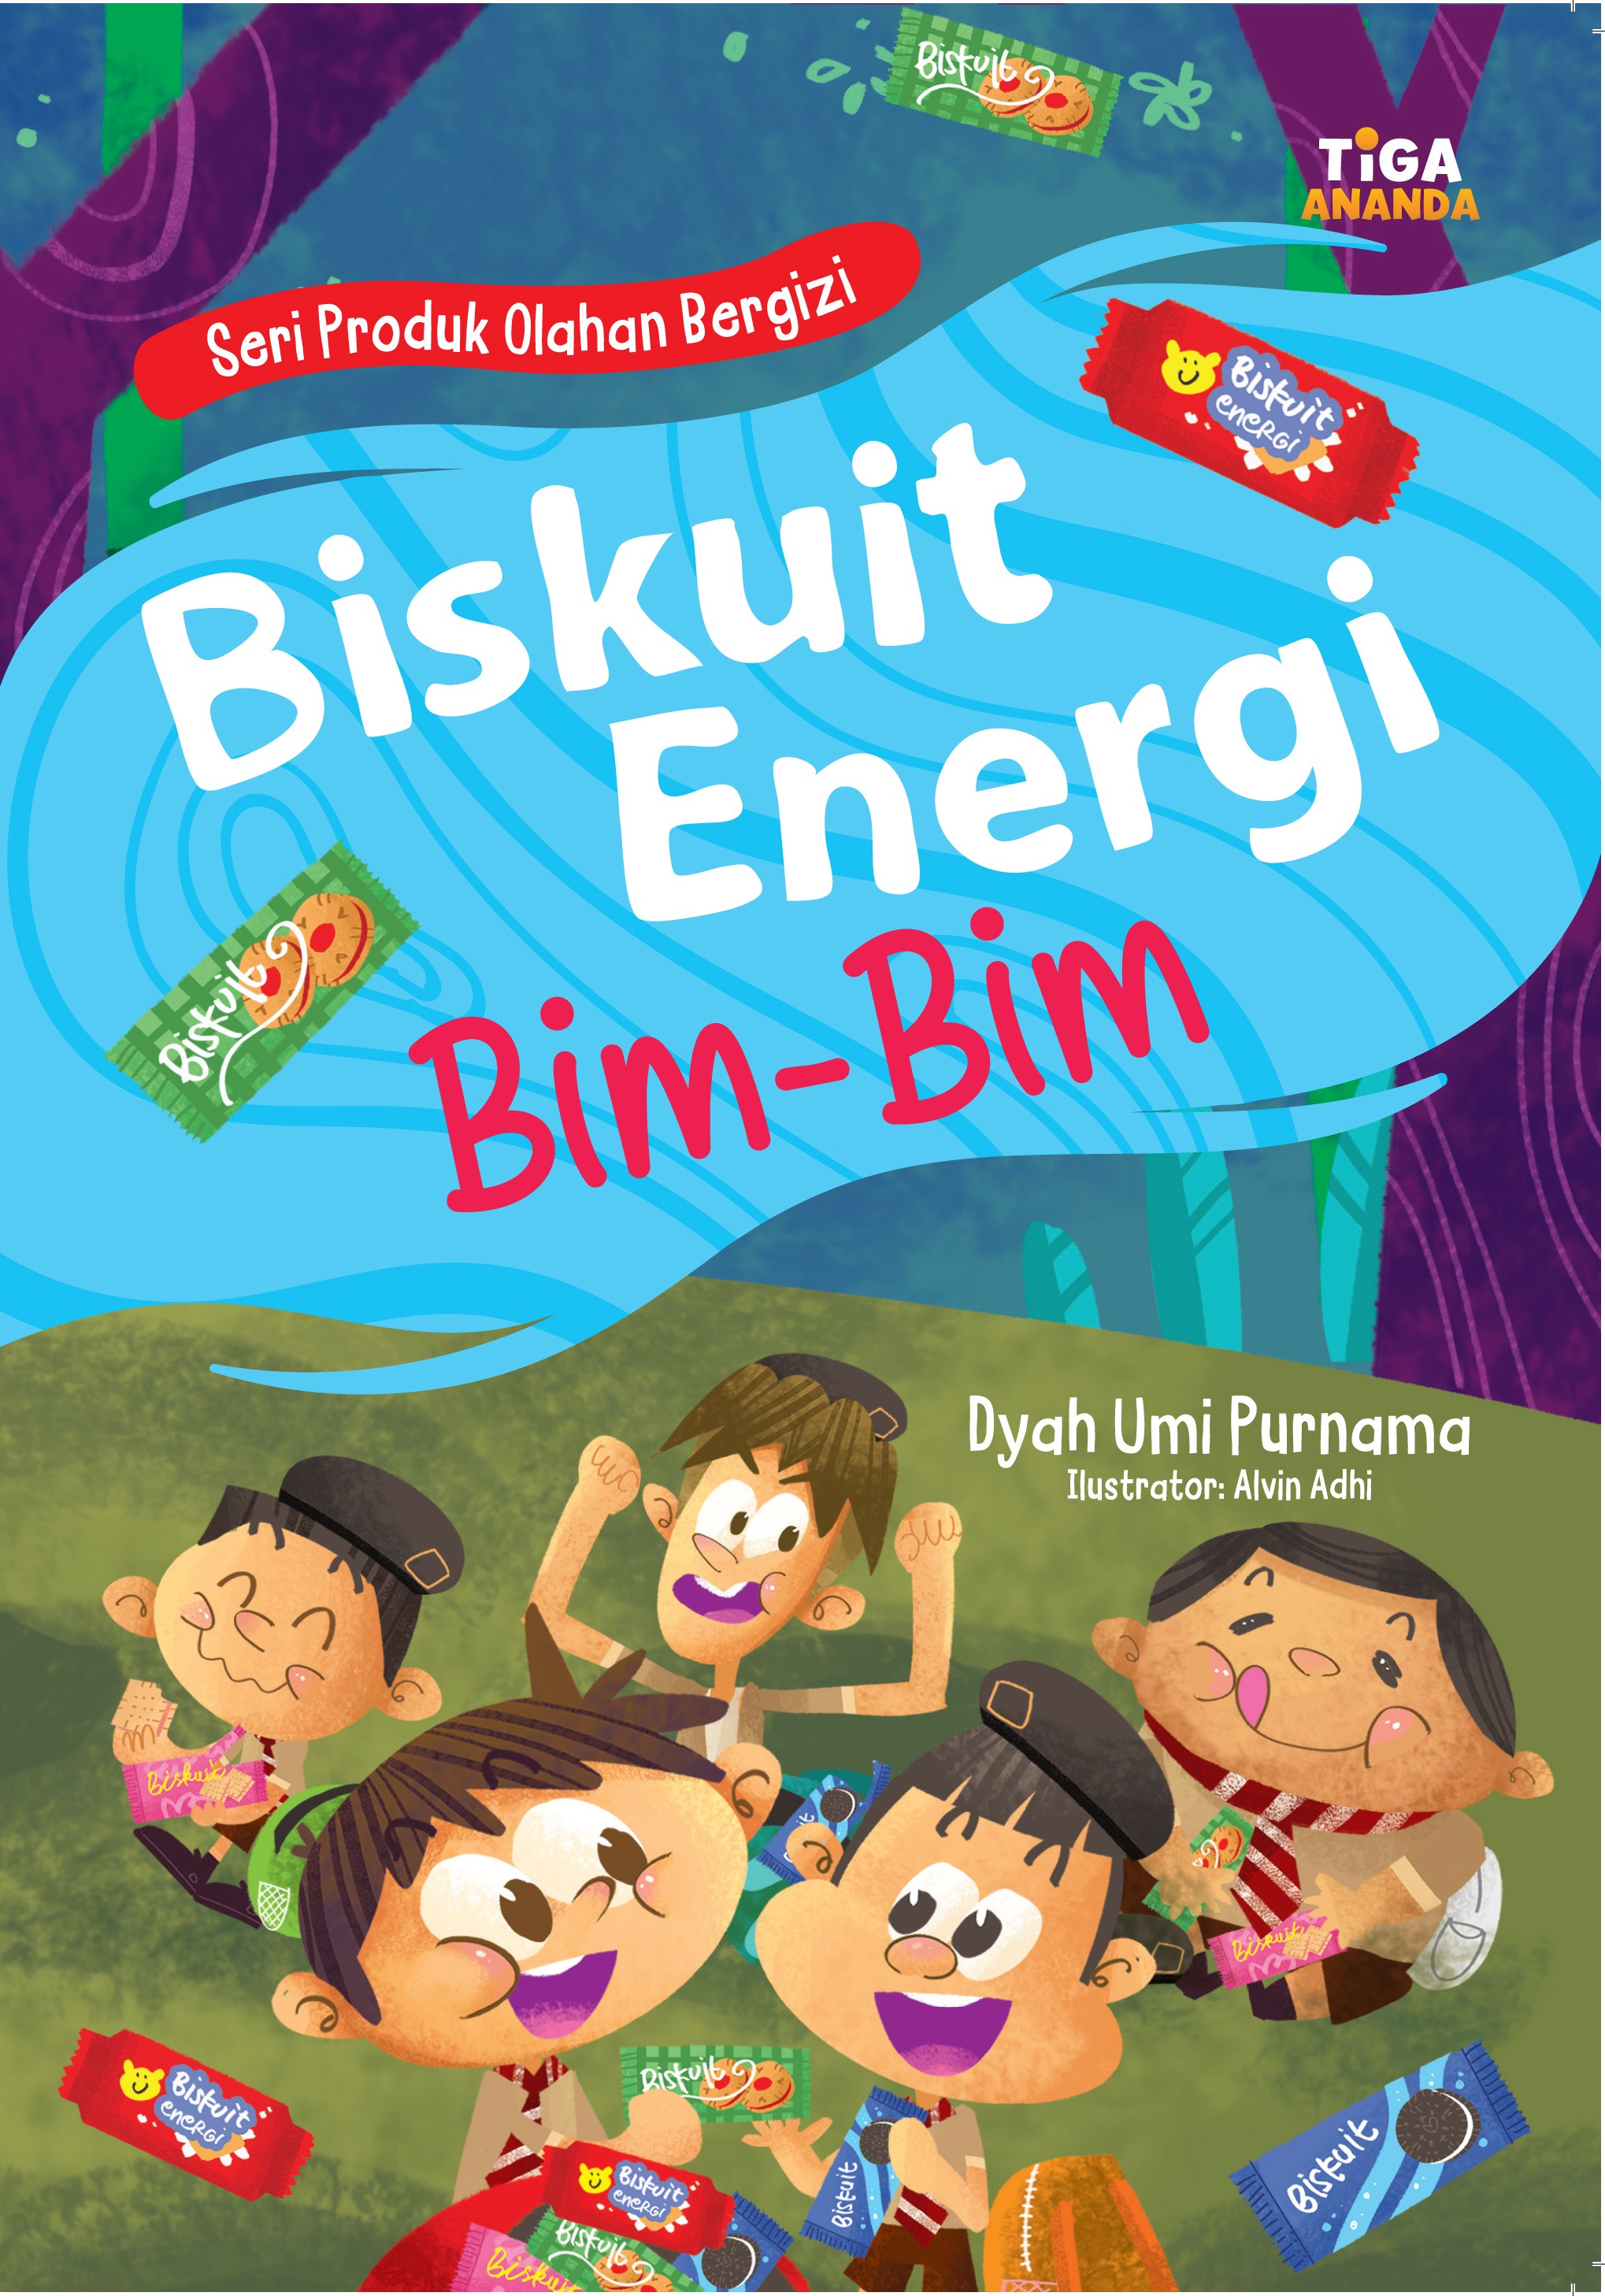 Biskuit energi Bim-bim [sumber elektronis]